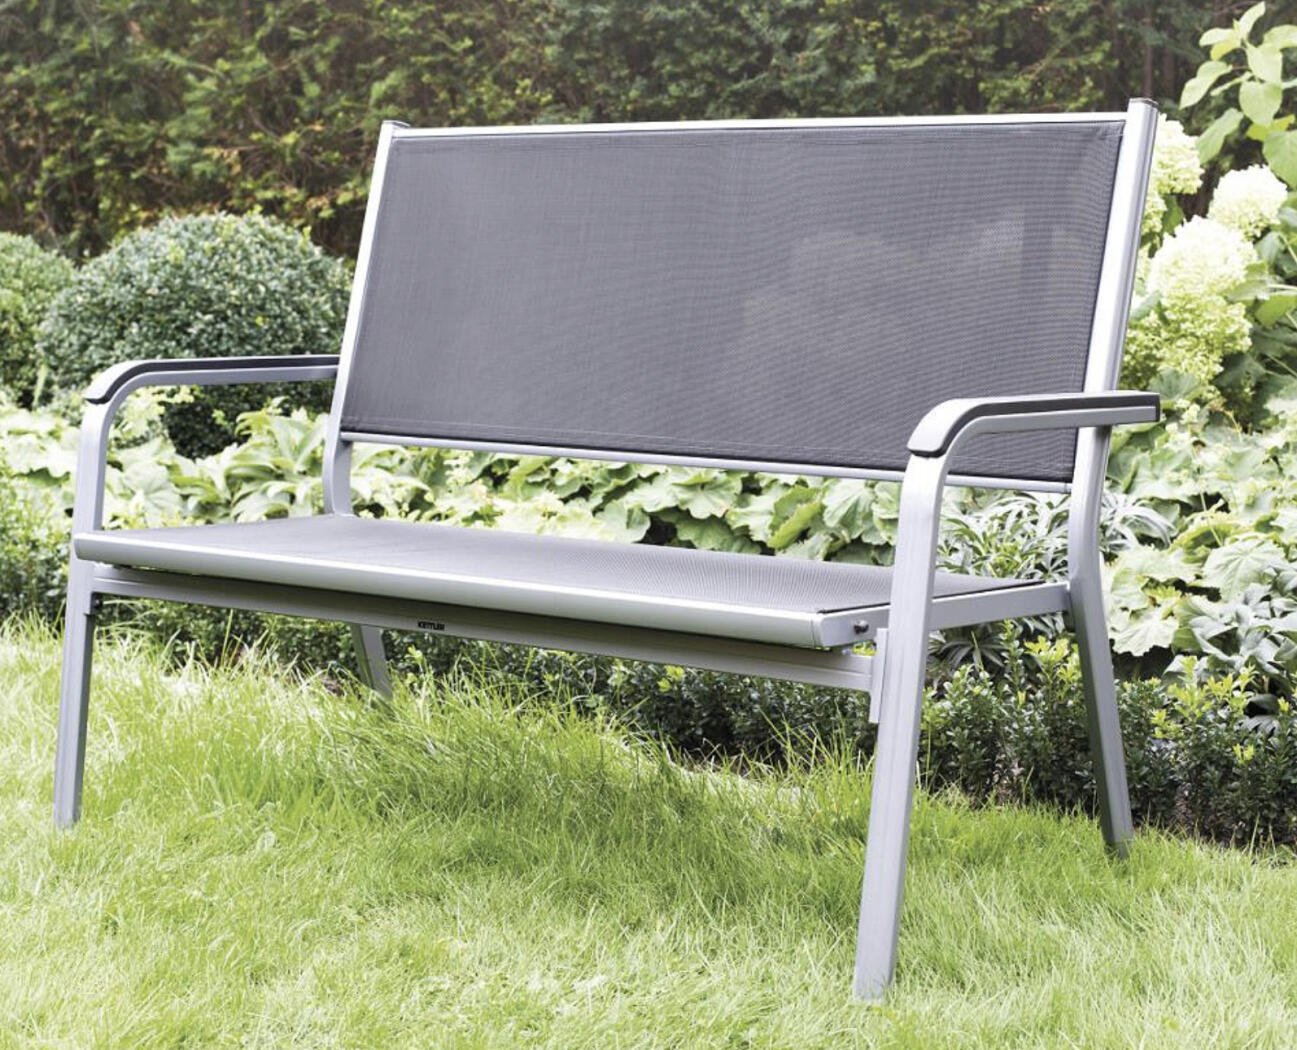 Full Size of Kettler 2er Gartenbank Basic Plus Aluminium Mit Edelstahlschrauben Relaxsessel Garten Aldi Wohnzimmer Aldi Gartenbank